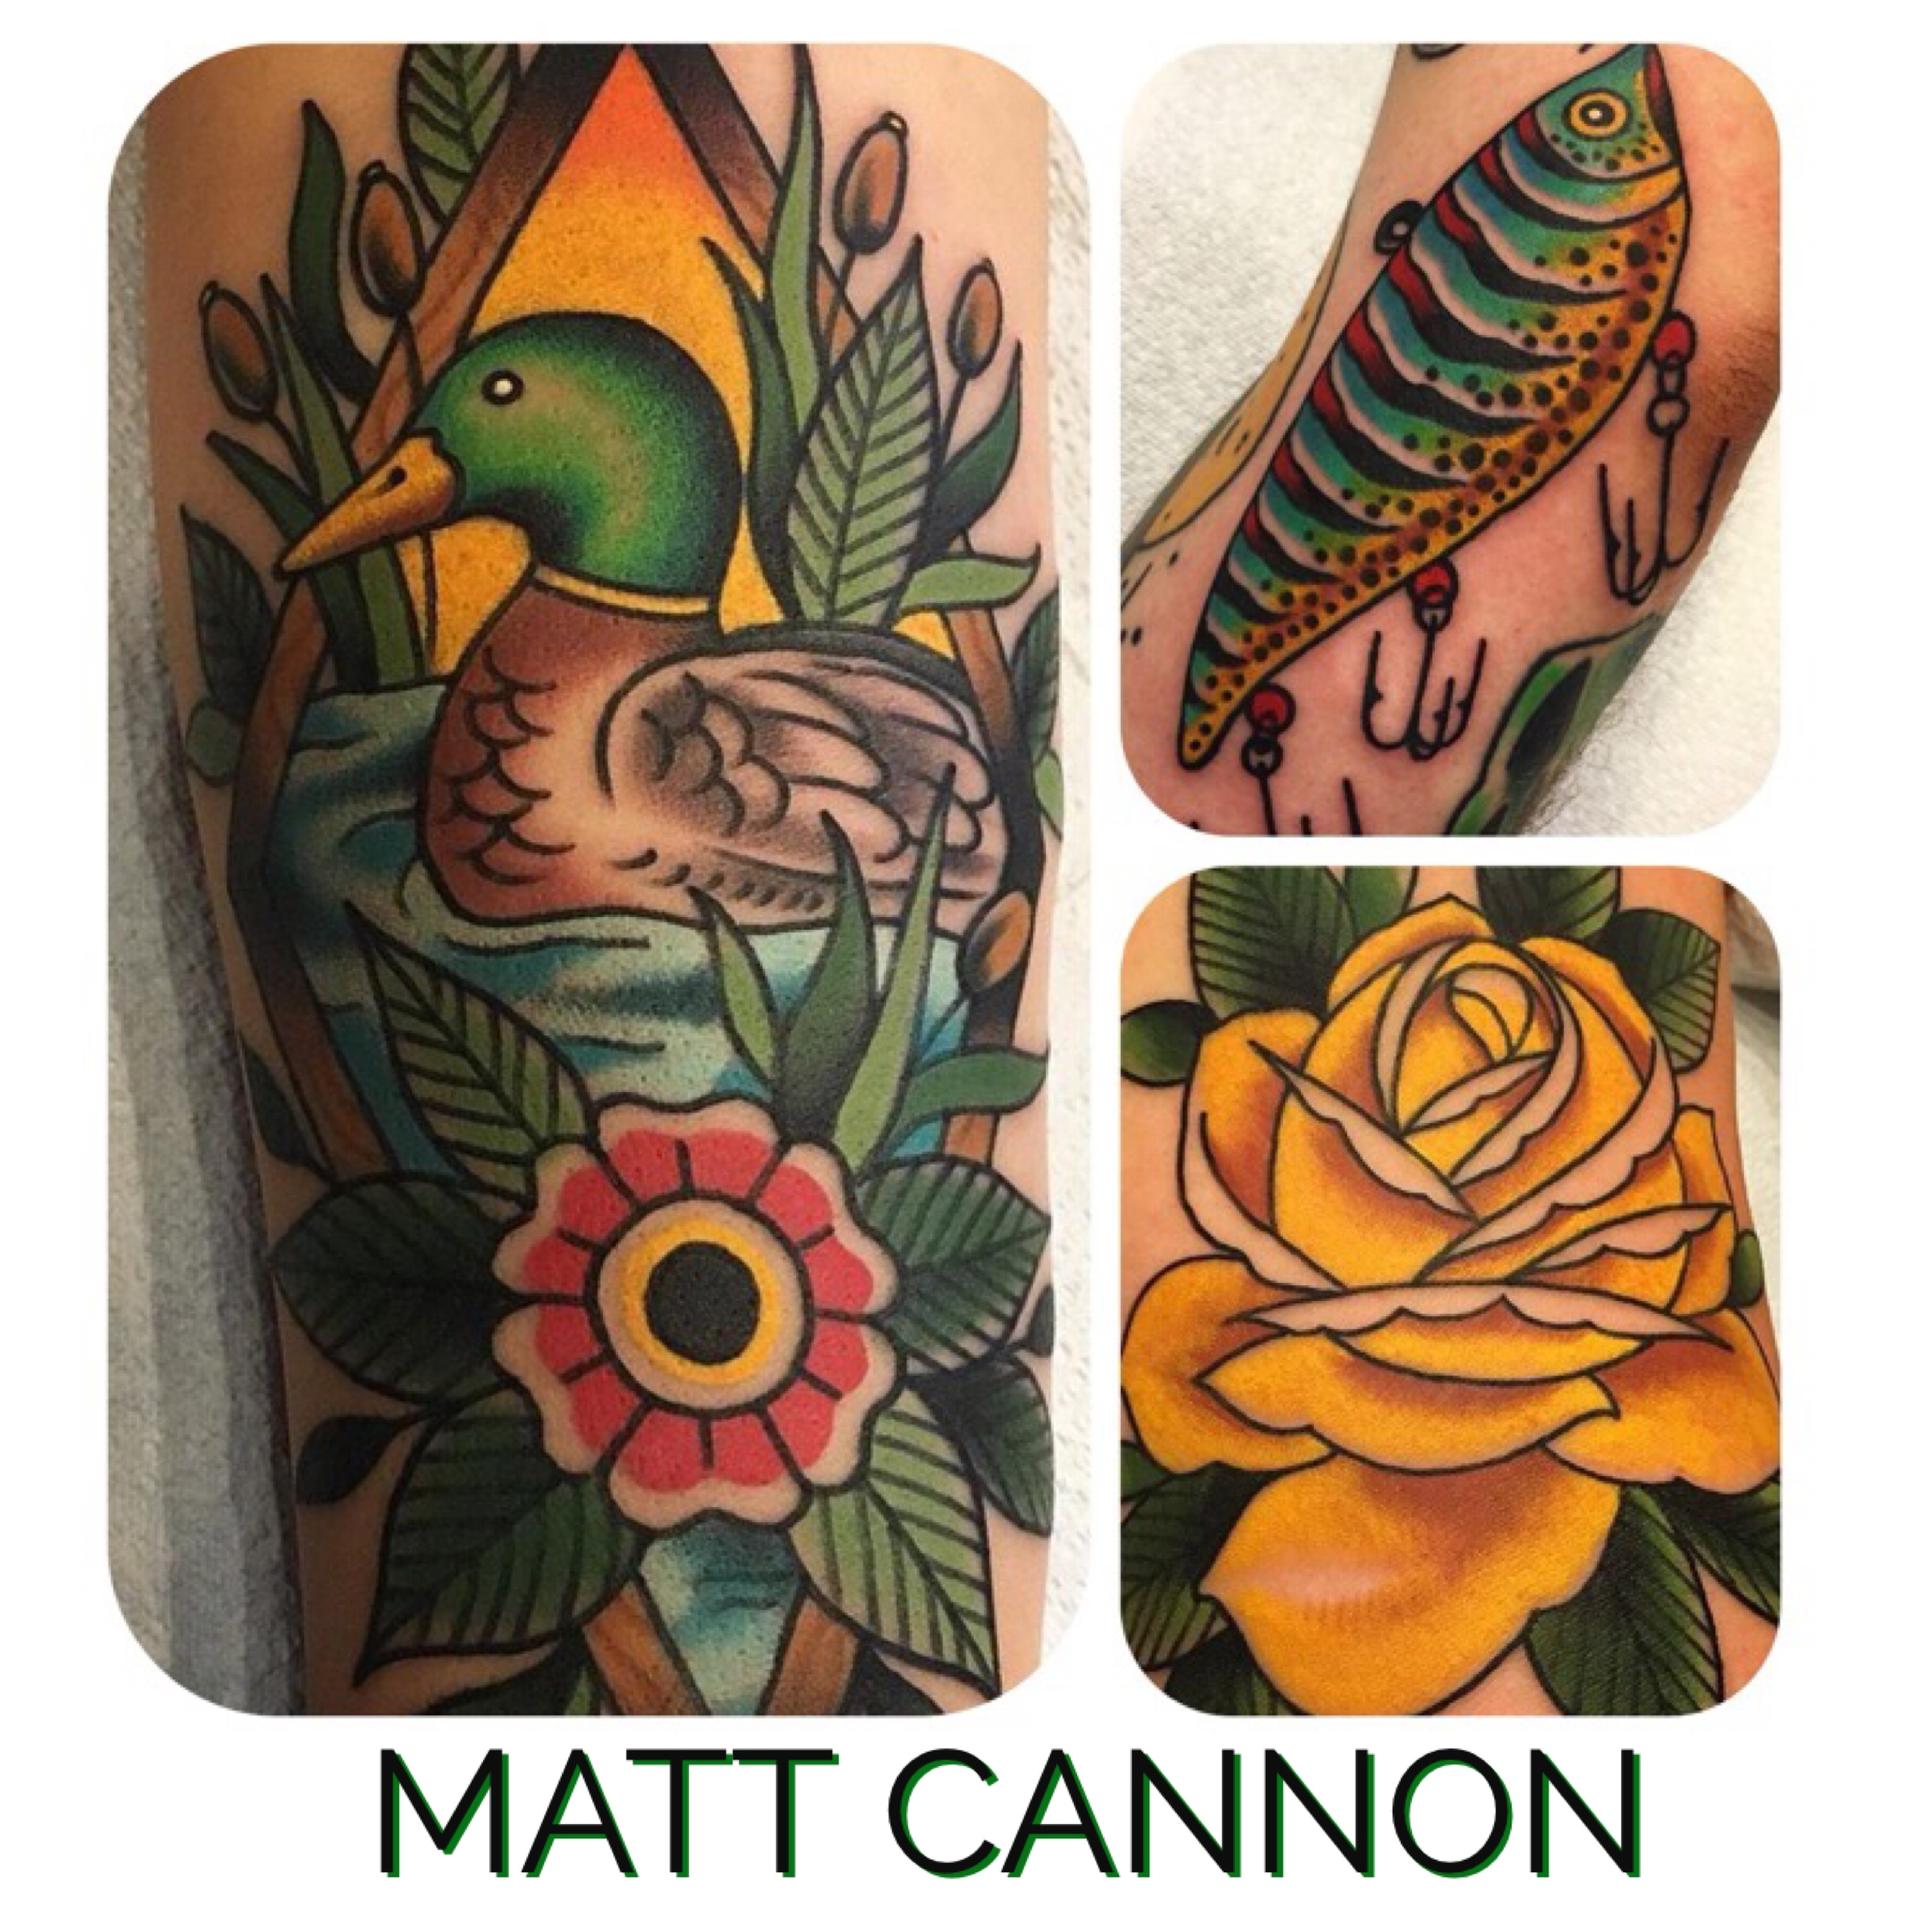 Matt Cannon for Torch Tattoo